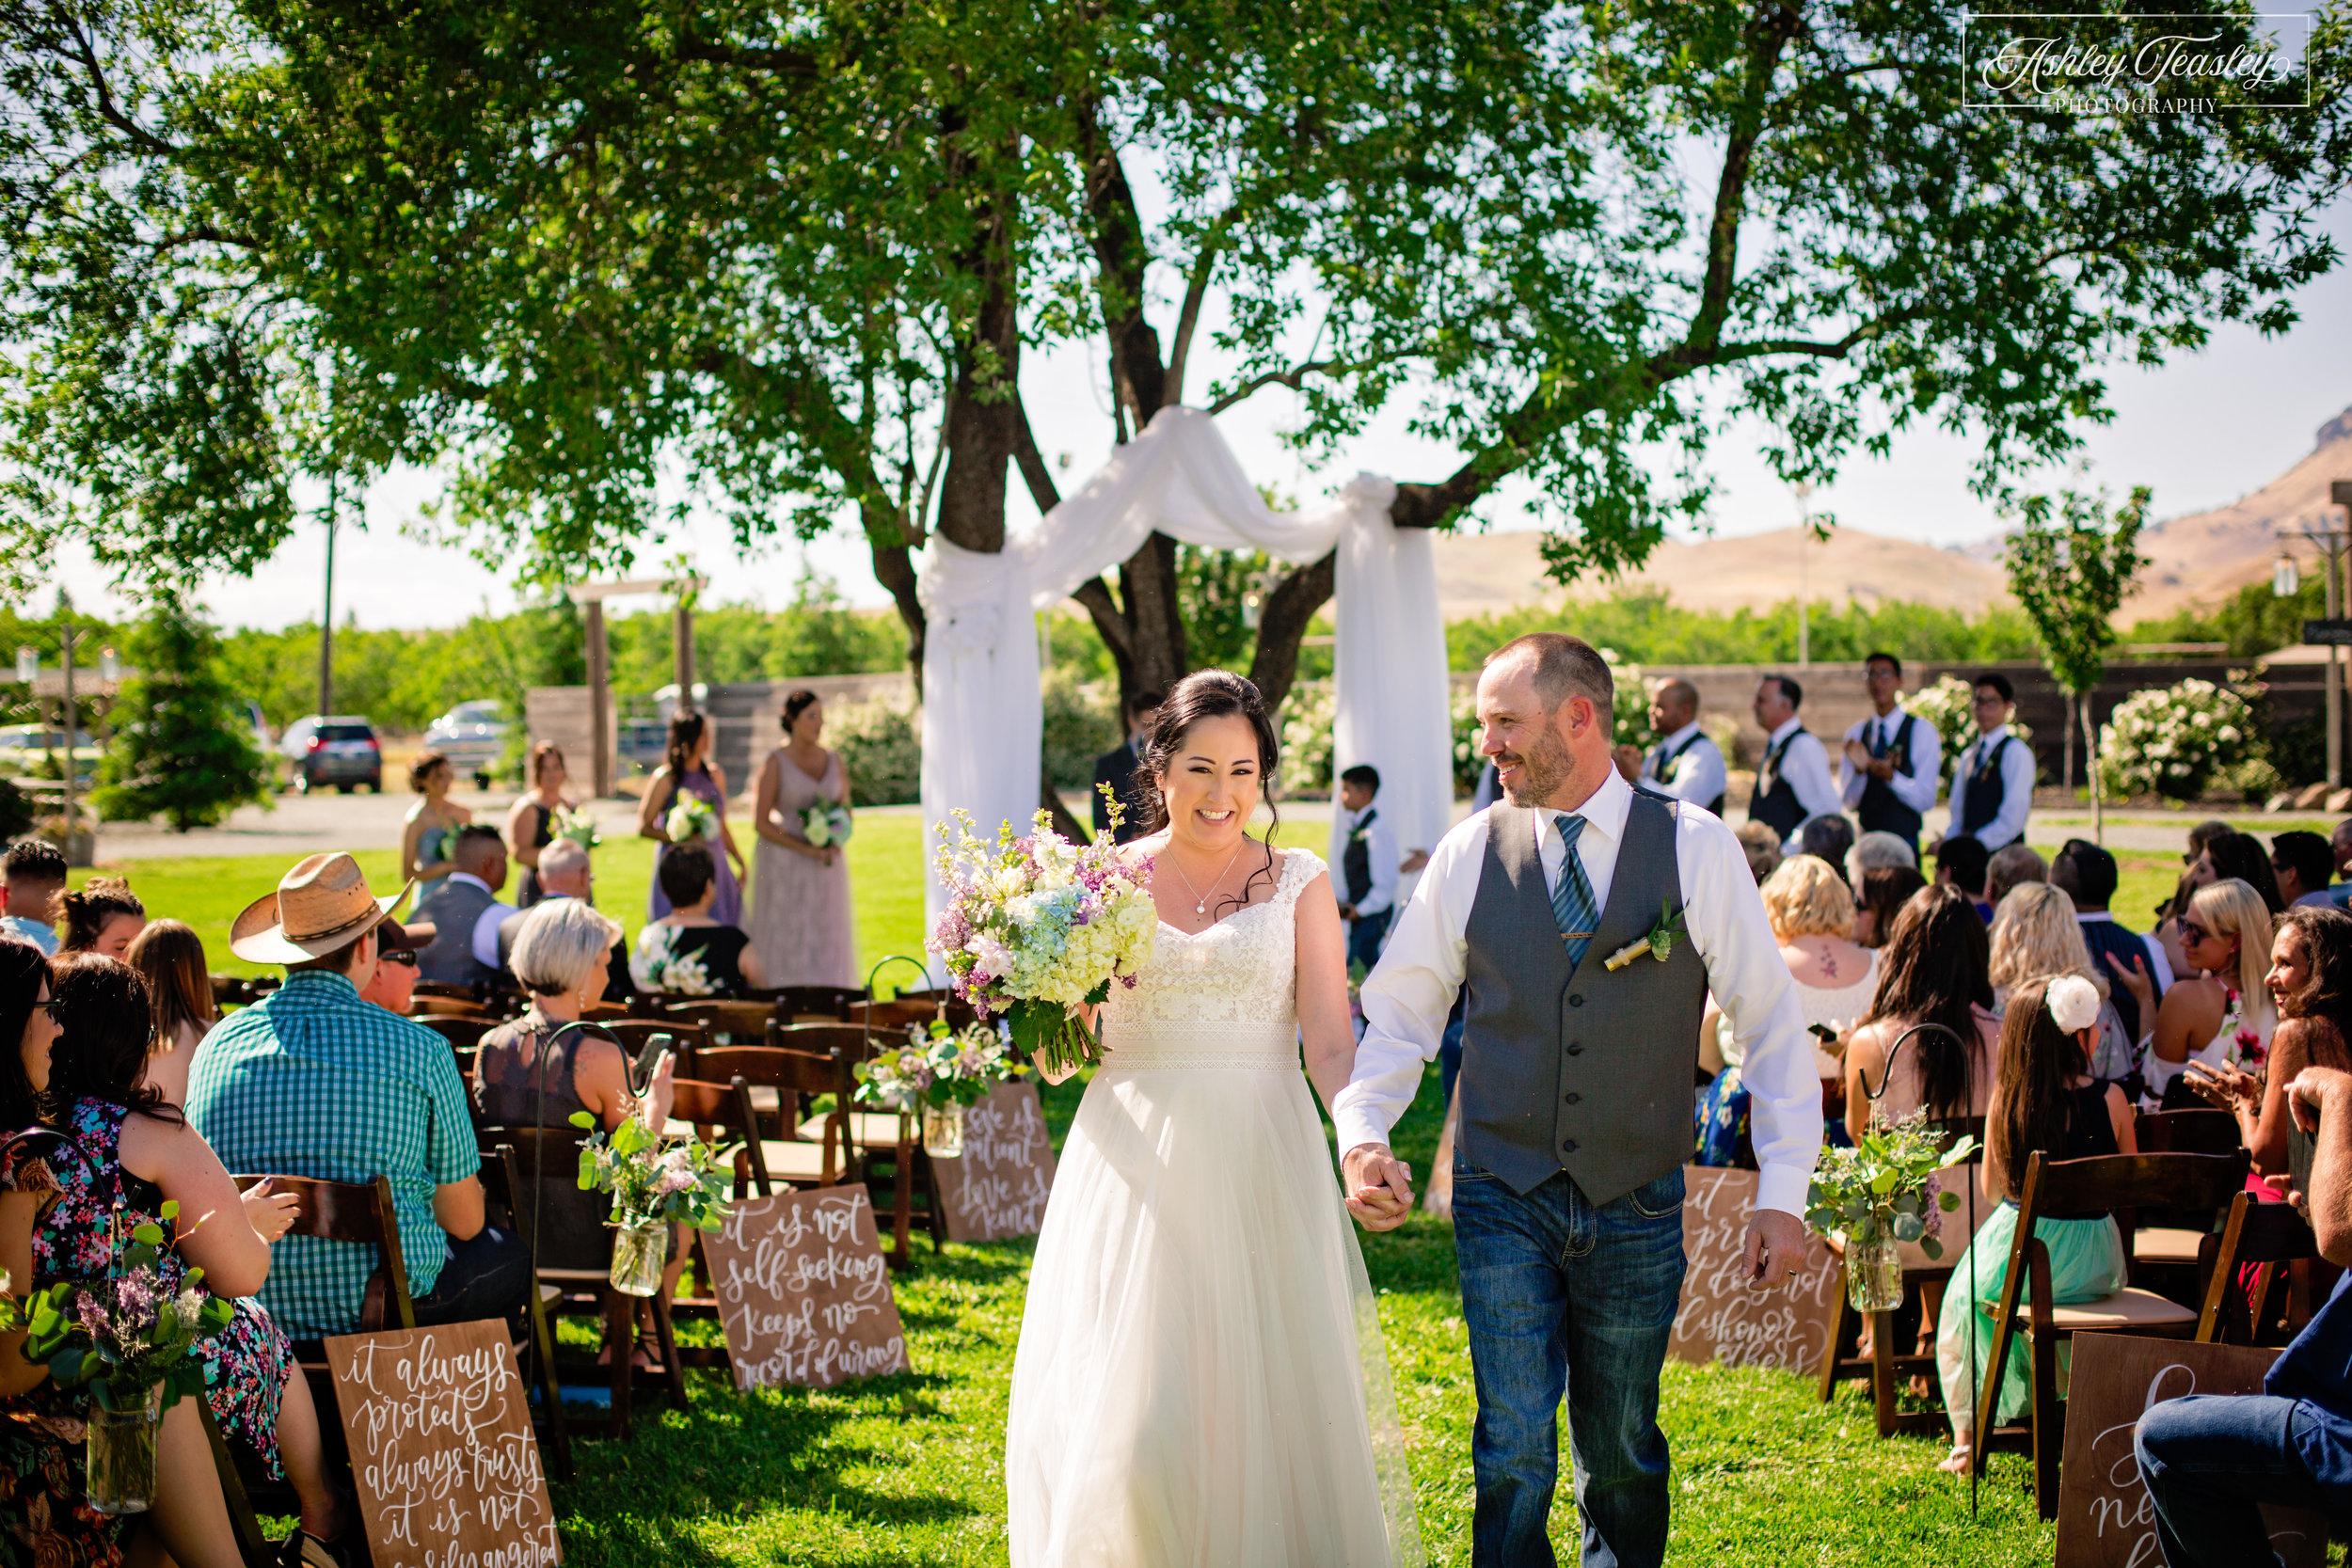 Jeanette & Rance - Butte Star Ranch - Sacramento Wedding Photographer - Ashley Teasley Photography (17 of 41).jpg